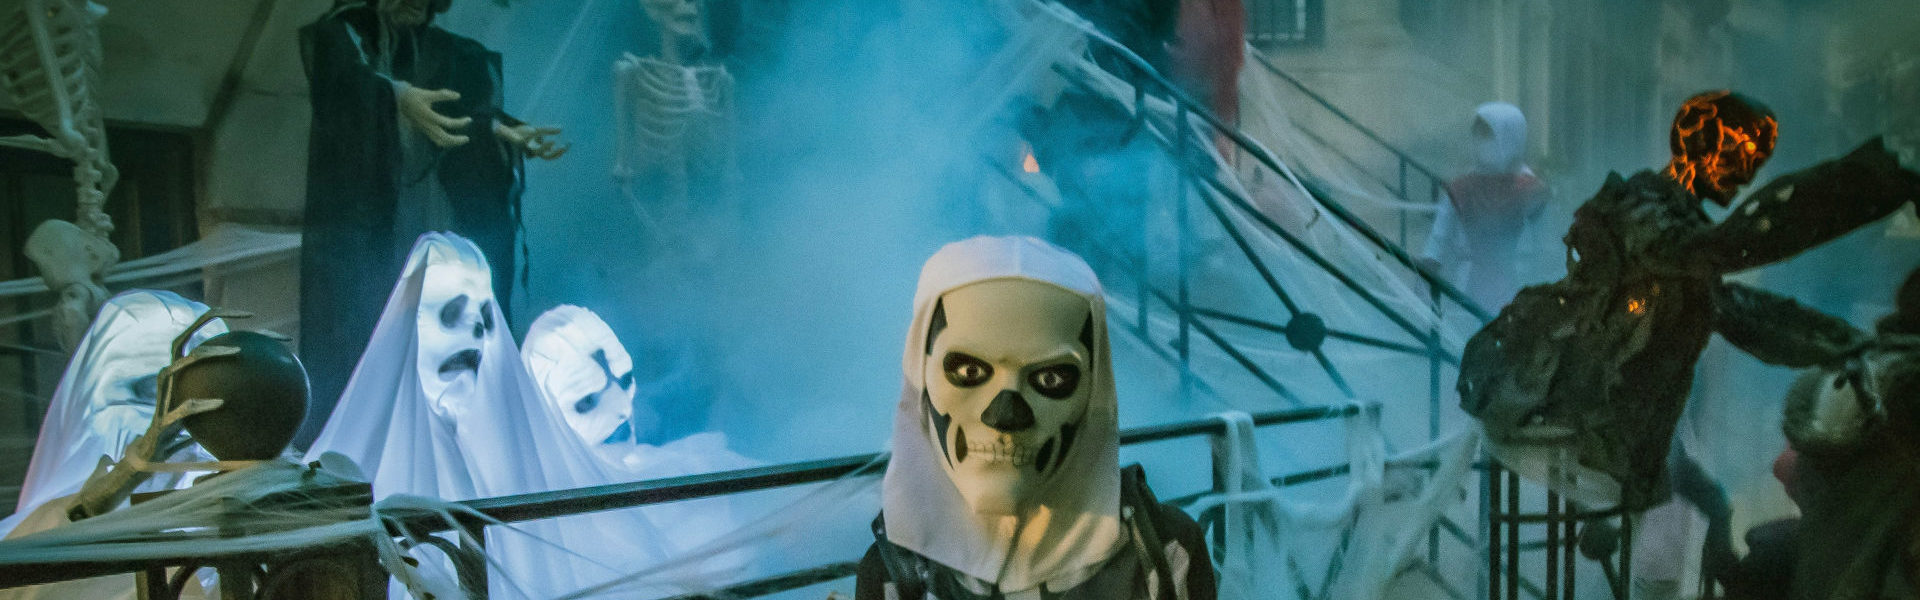 Concurs Decembrie 2020 - Fantome, monștri, vampiri